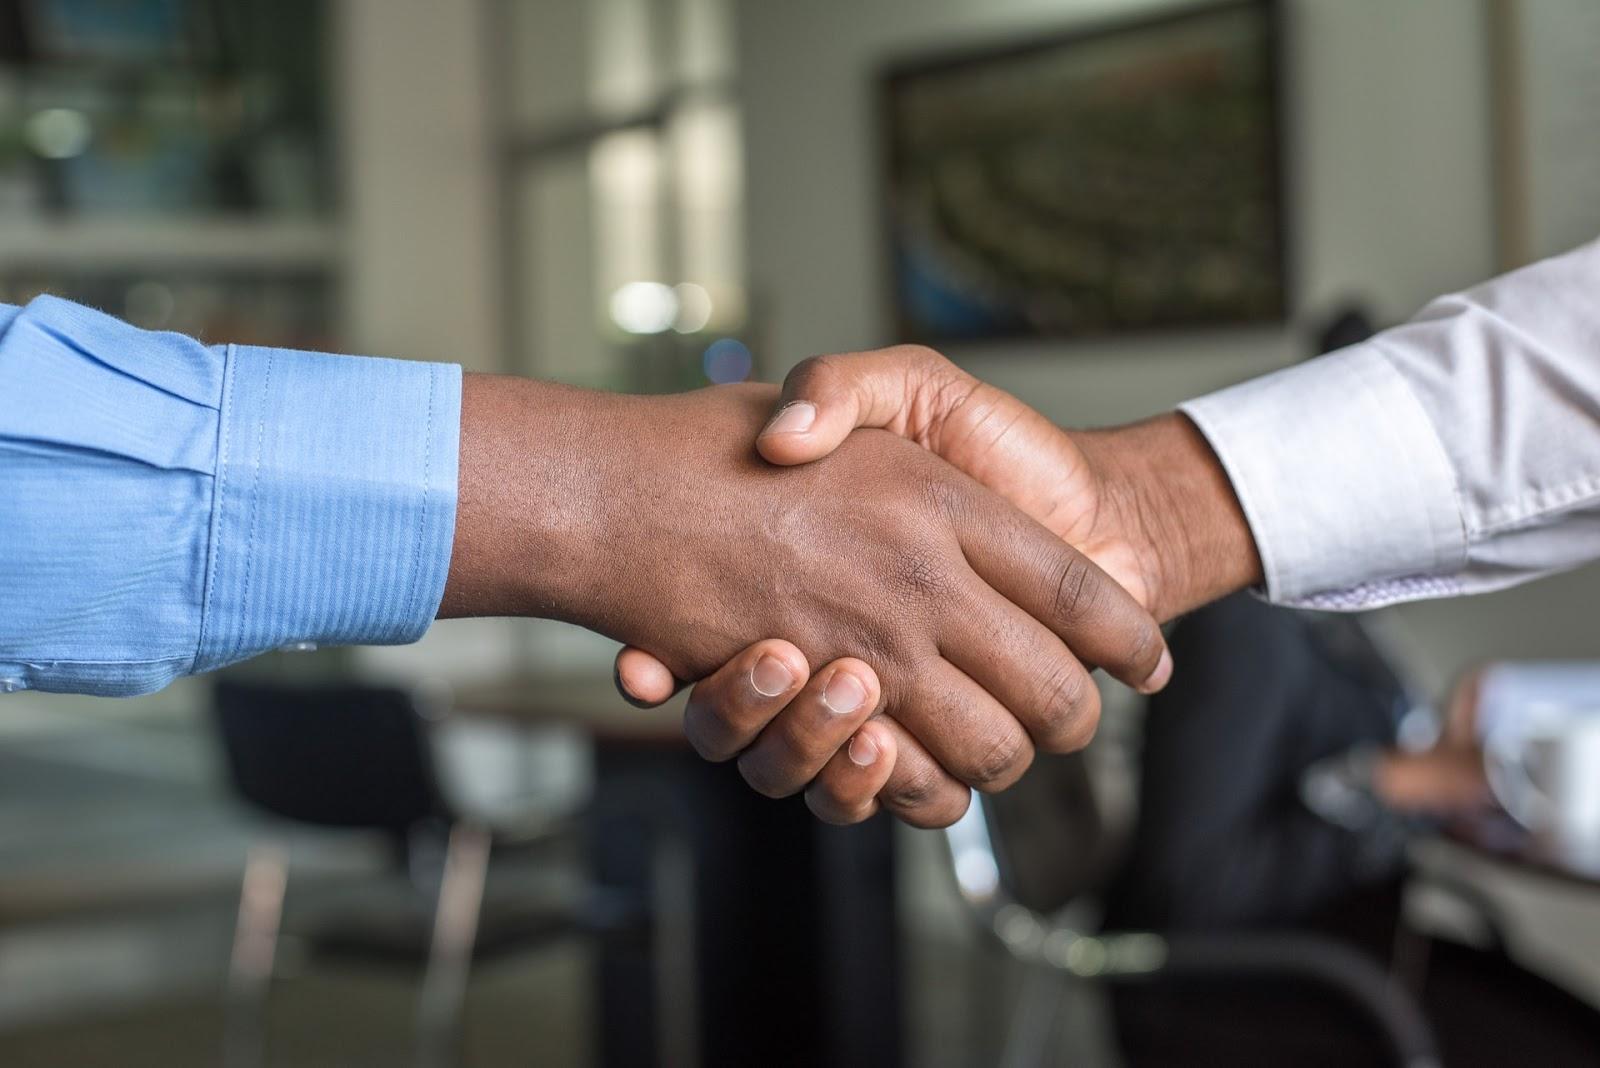 Photo of handshake describing how you can become a posh ambassador for selling on poshmark